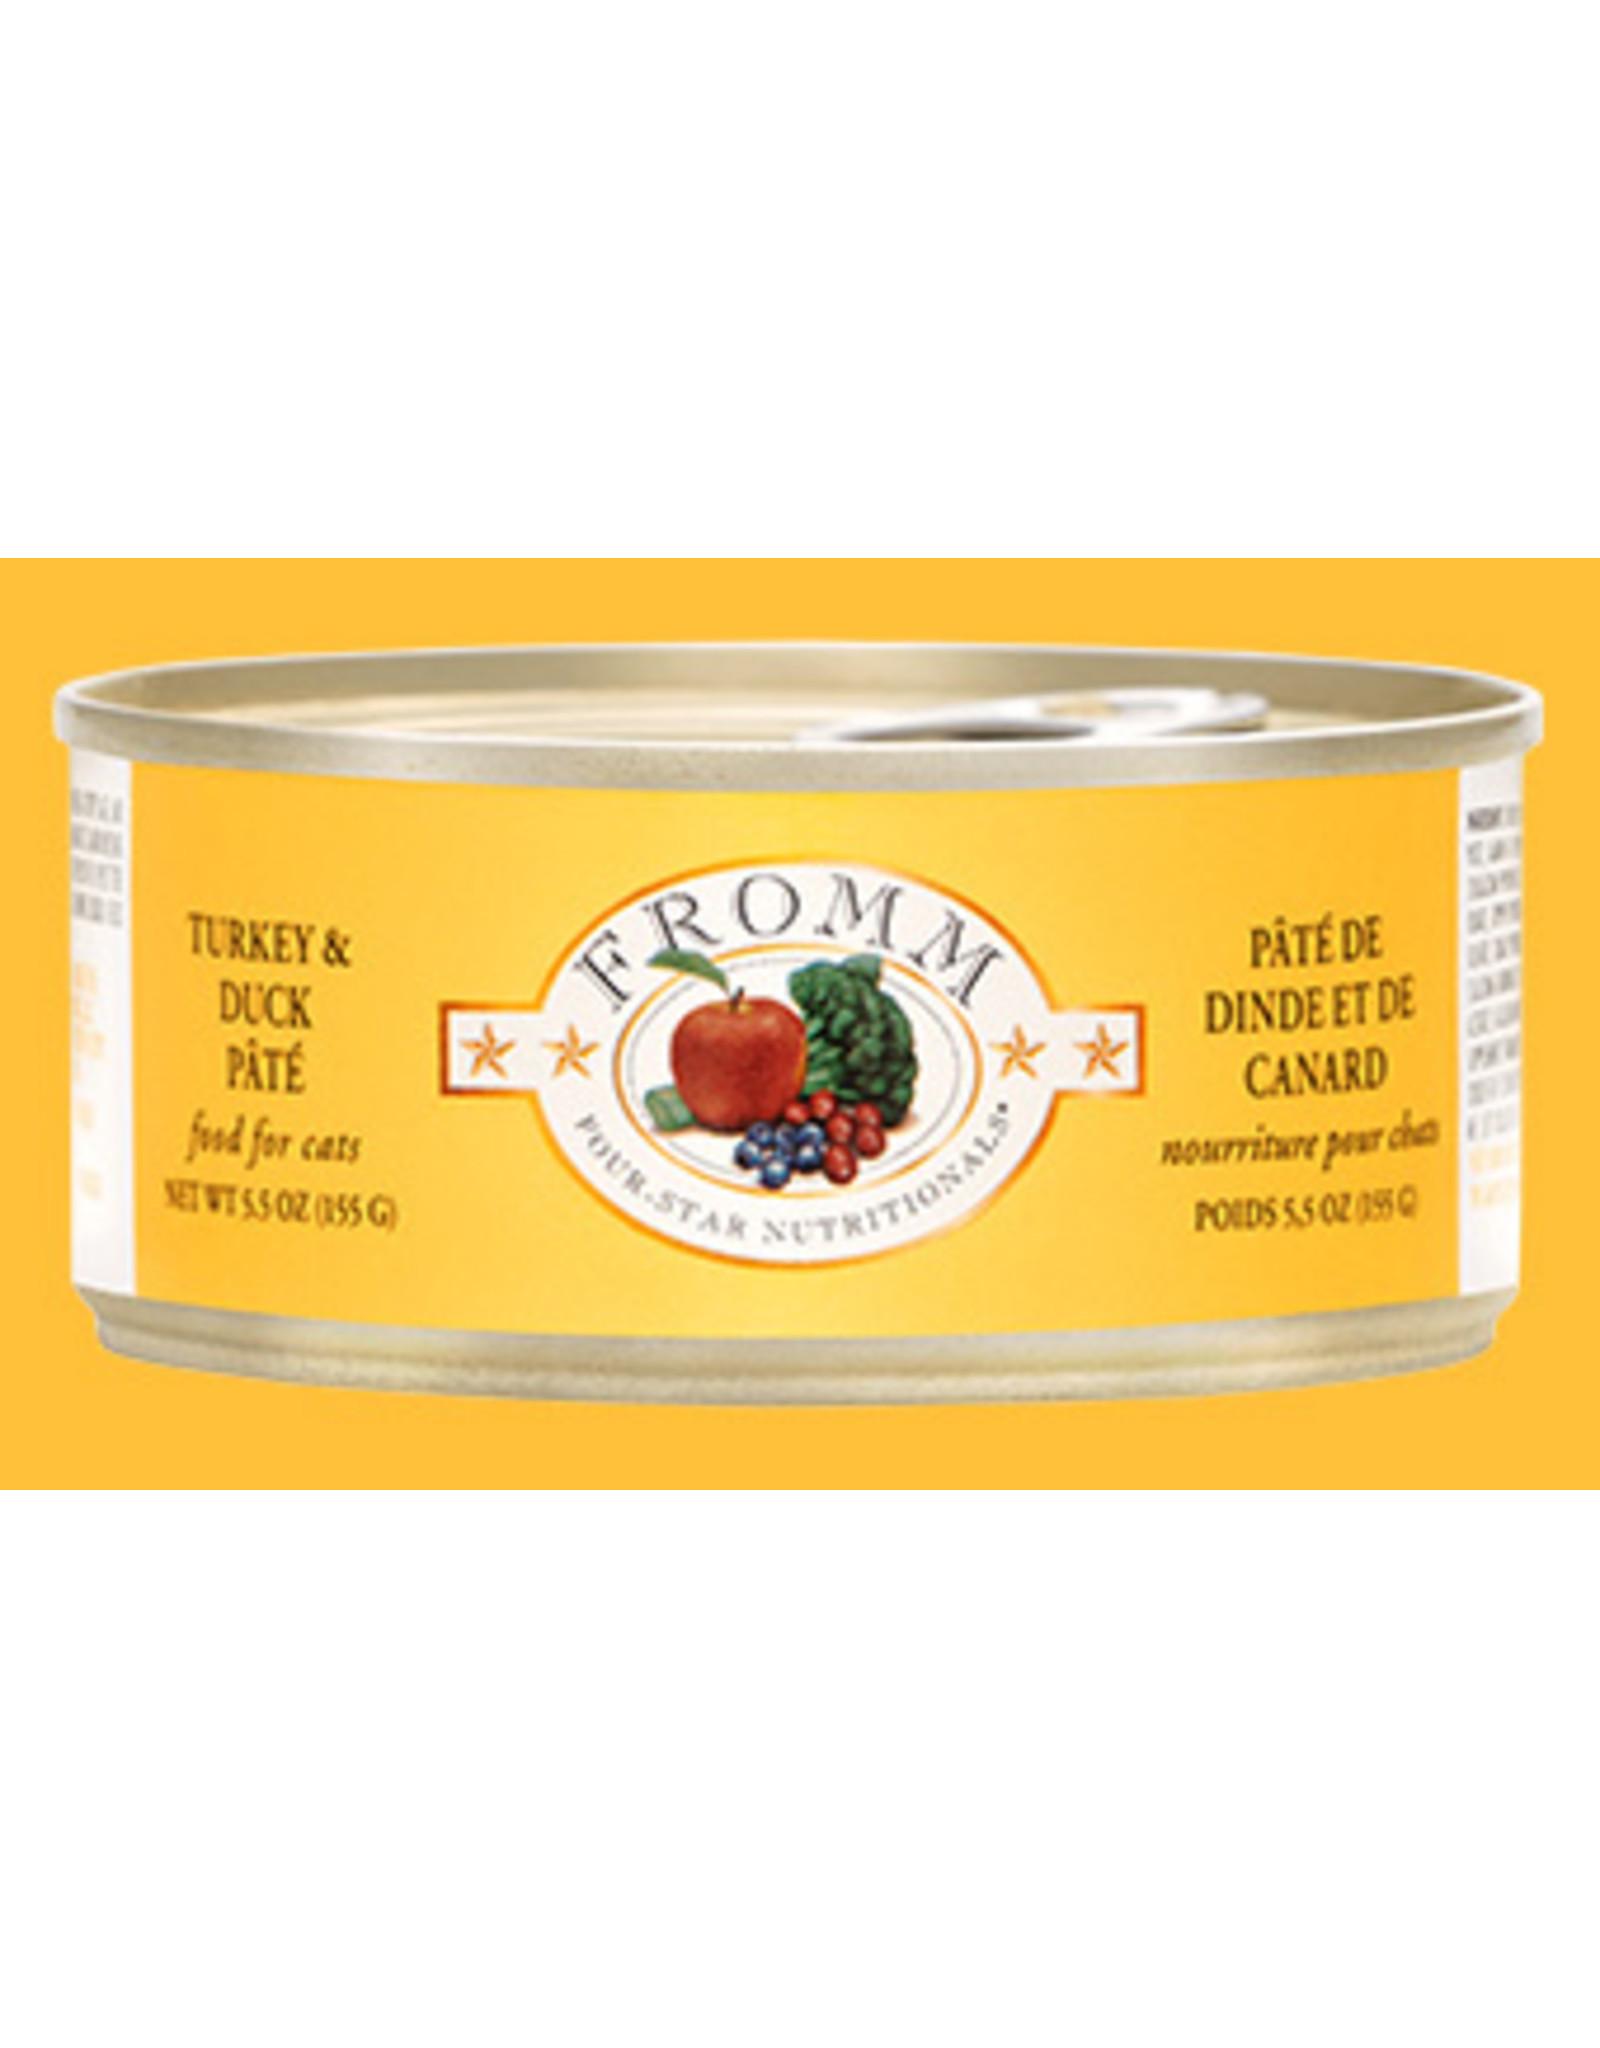 Fromm Fromm Four Star Grain Free Turkey & Duck Pate Wet Cat Food